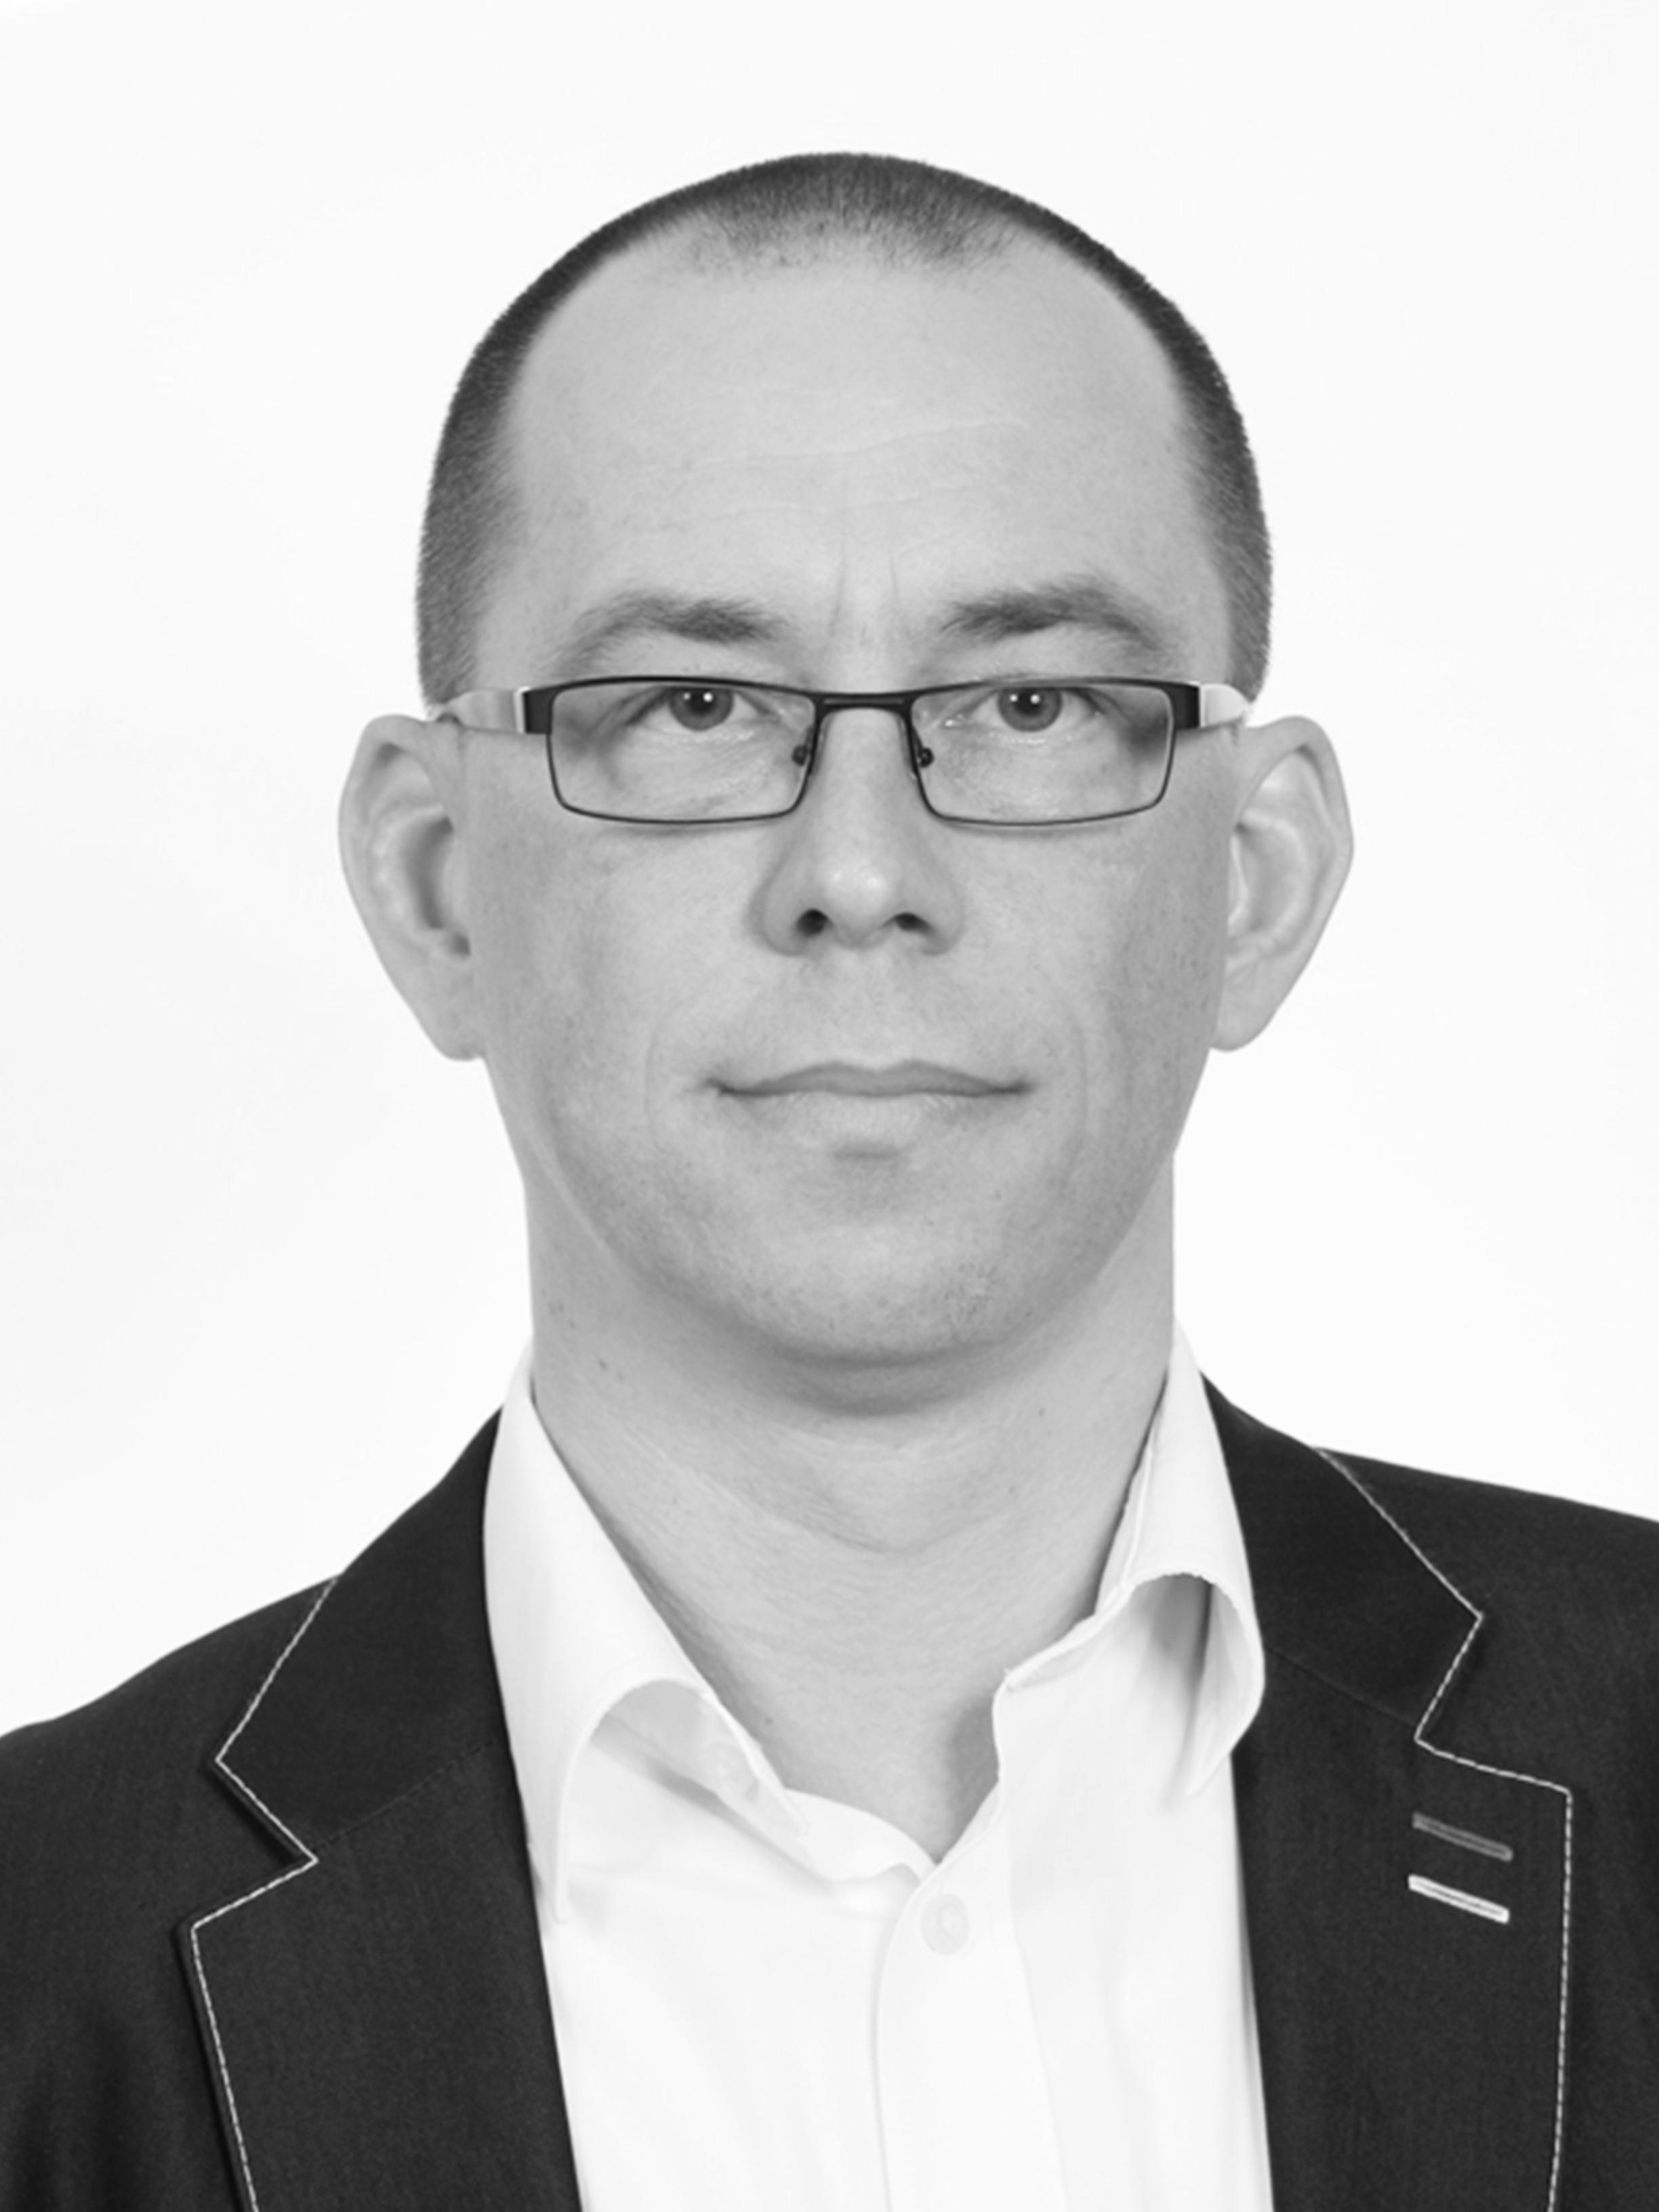 Grzegorz Sztarbała, PhD Eng